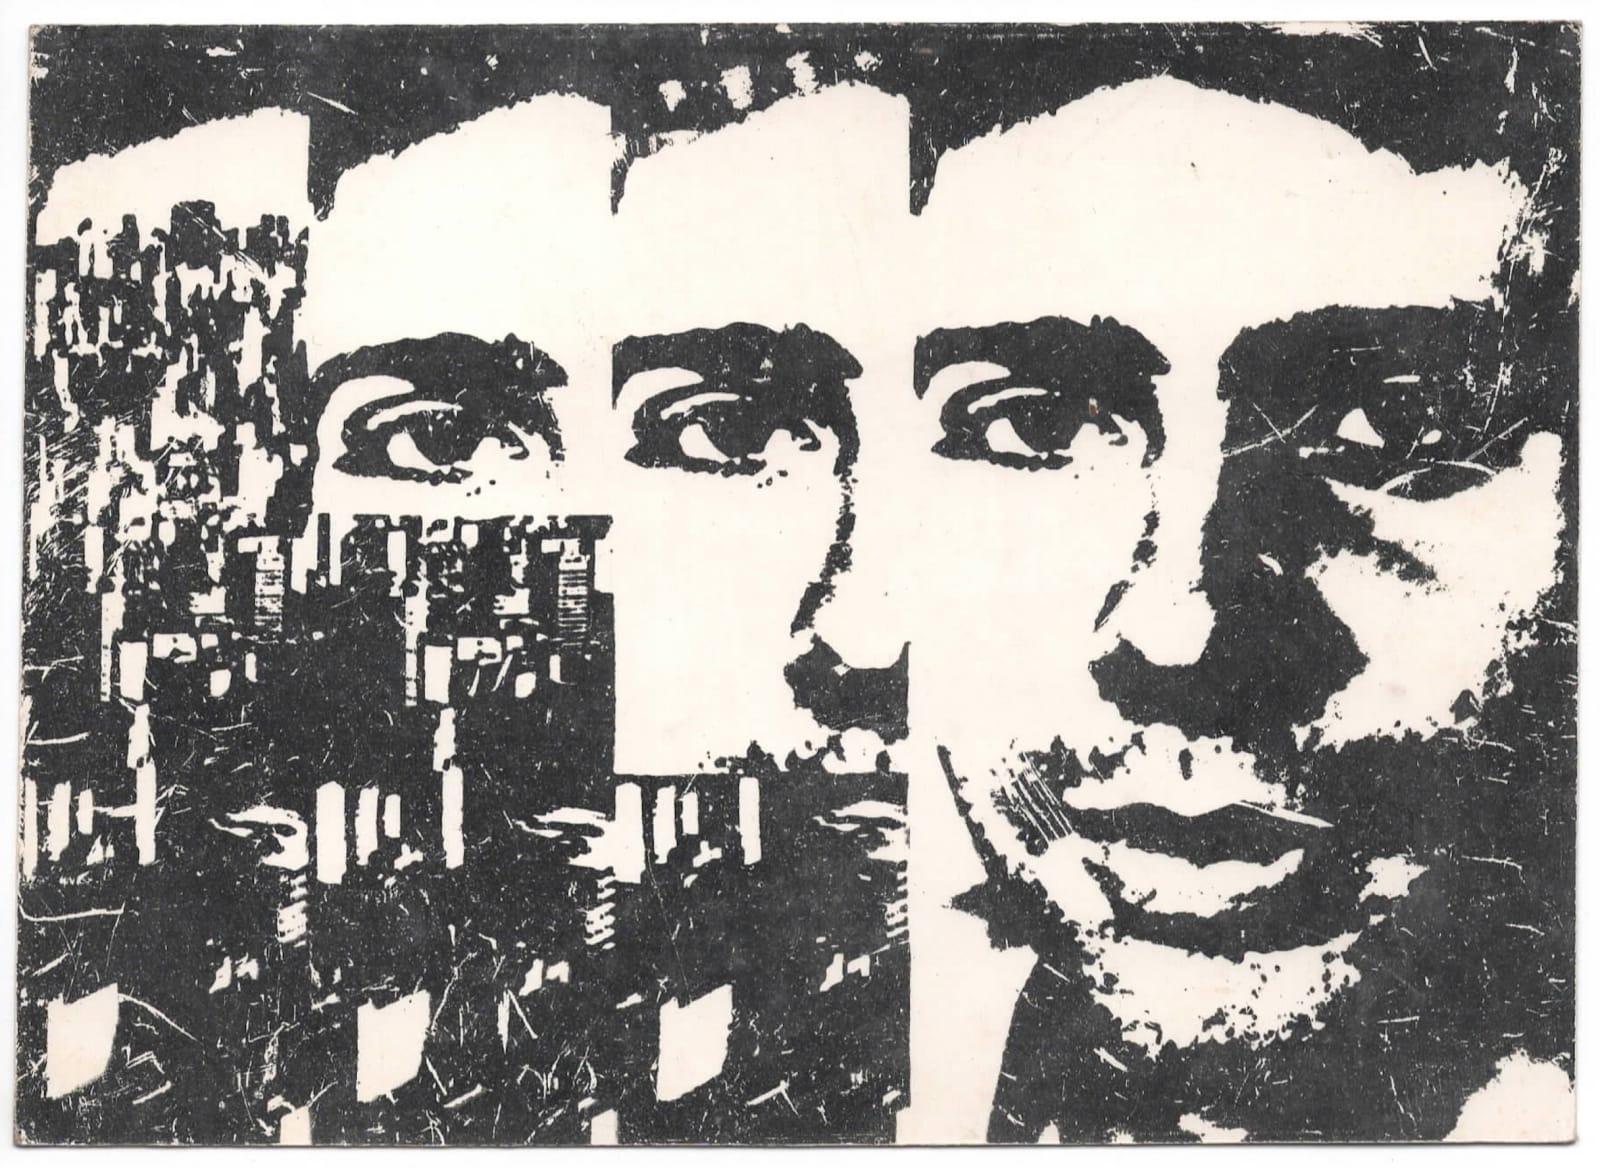 Rafael França, Untitled, 1979/1980